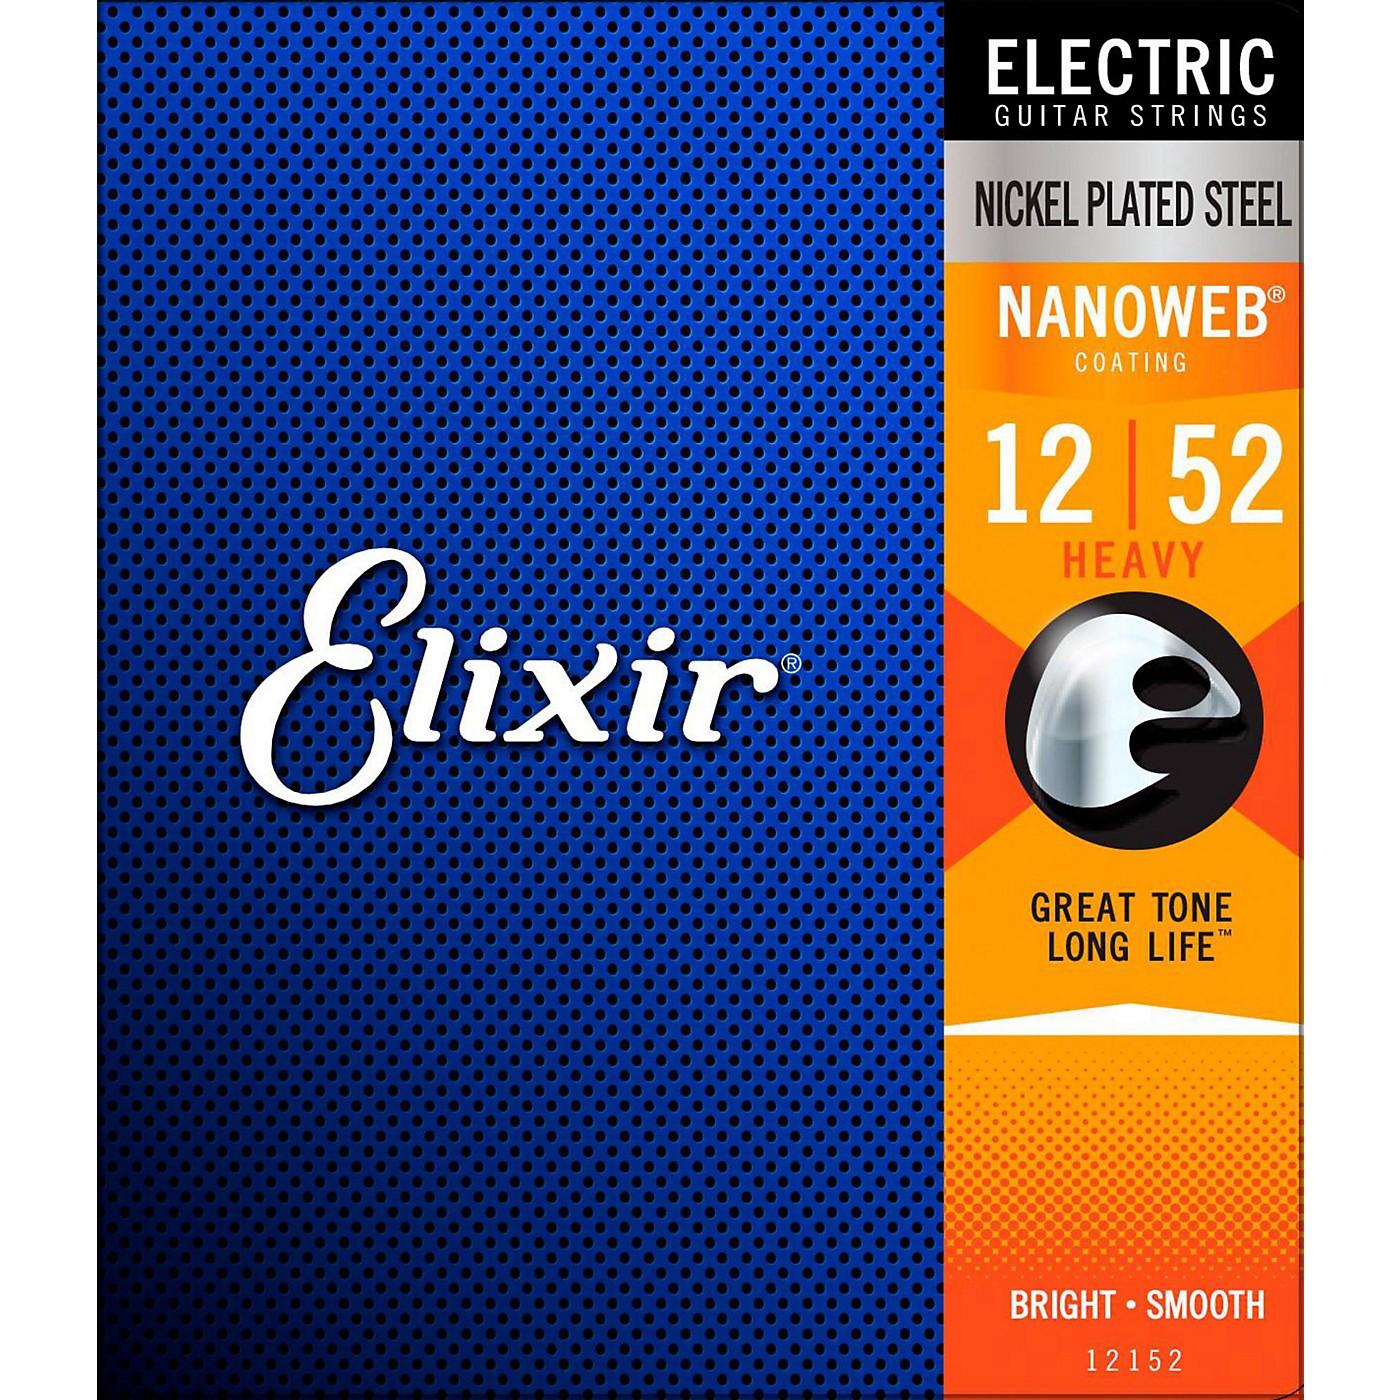 Elixir Electric Guitar Strings with NANOWEB Coating, Heavy (.012-.052) thumbnail